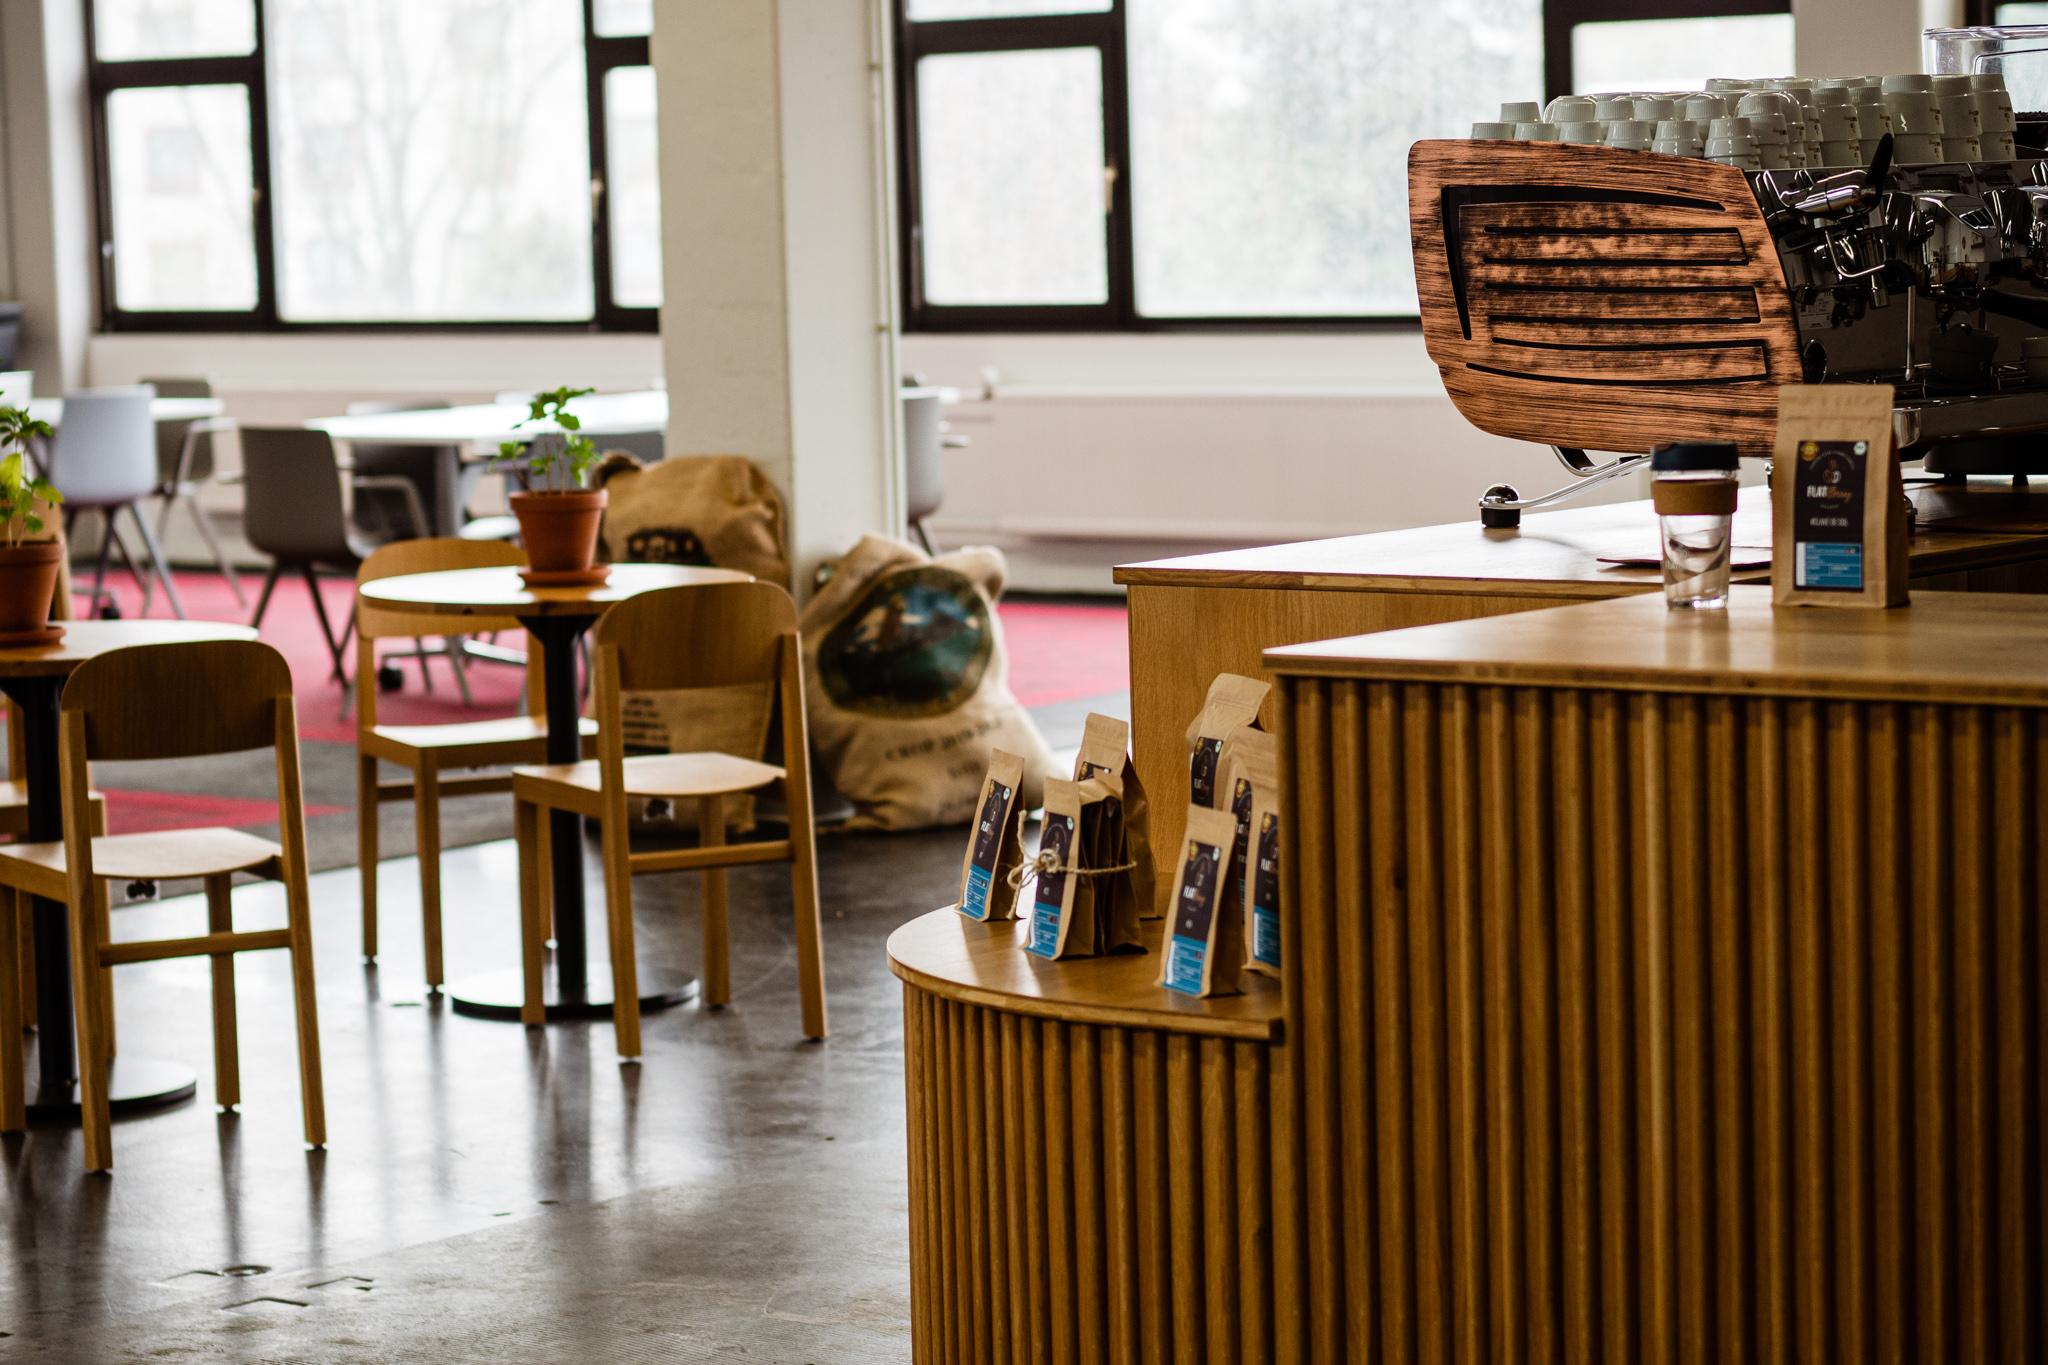 Raum Räumlichkeiten Kaffeeseminar Baristakurs